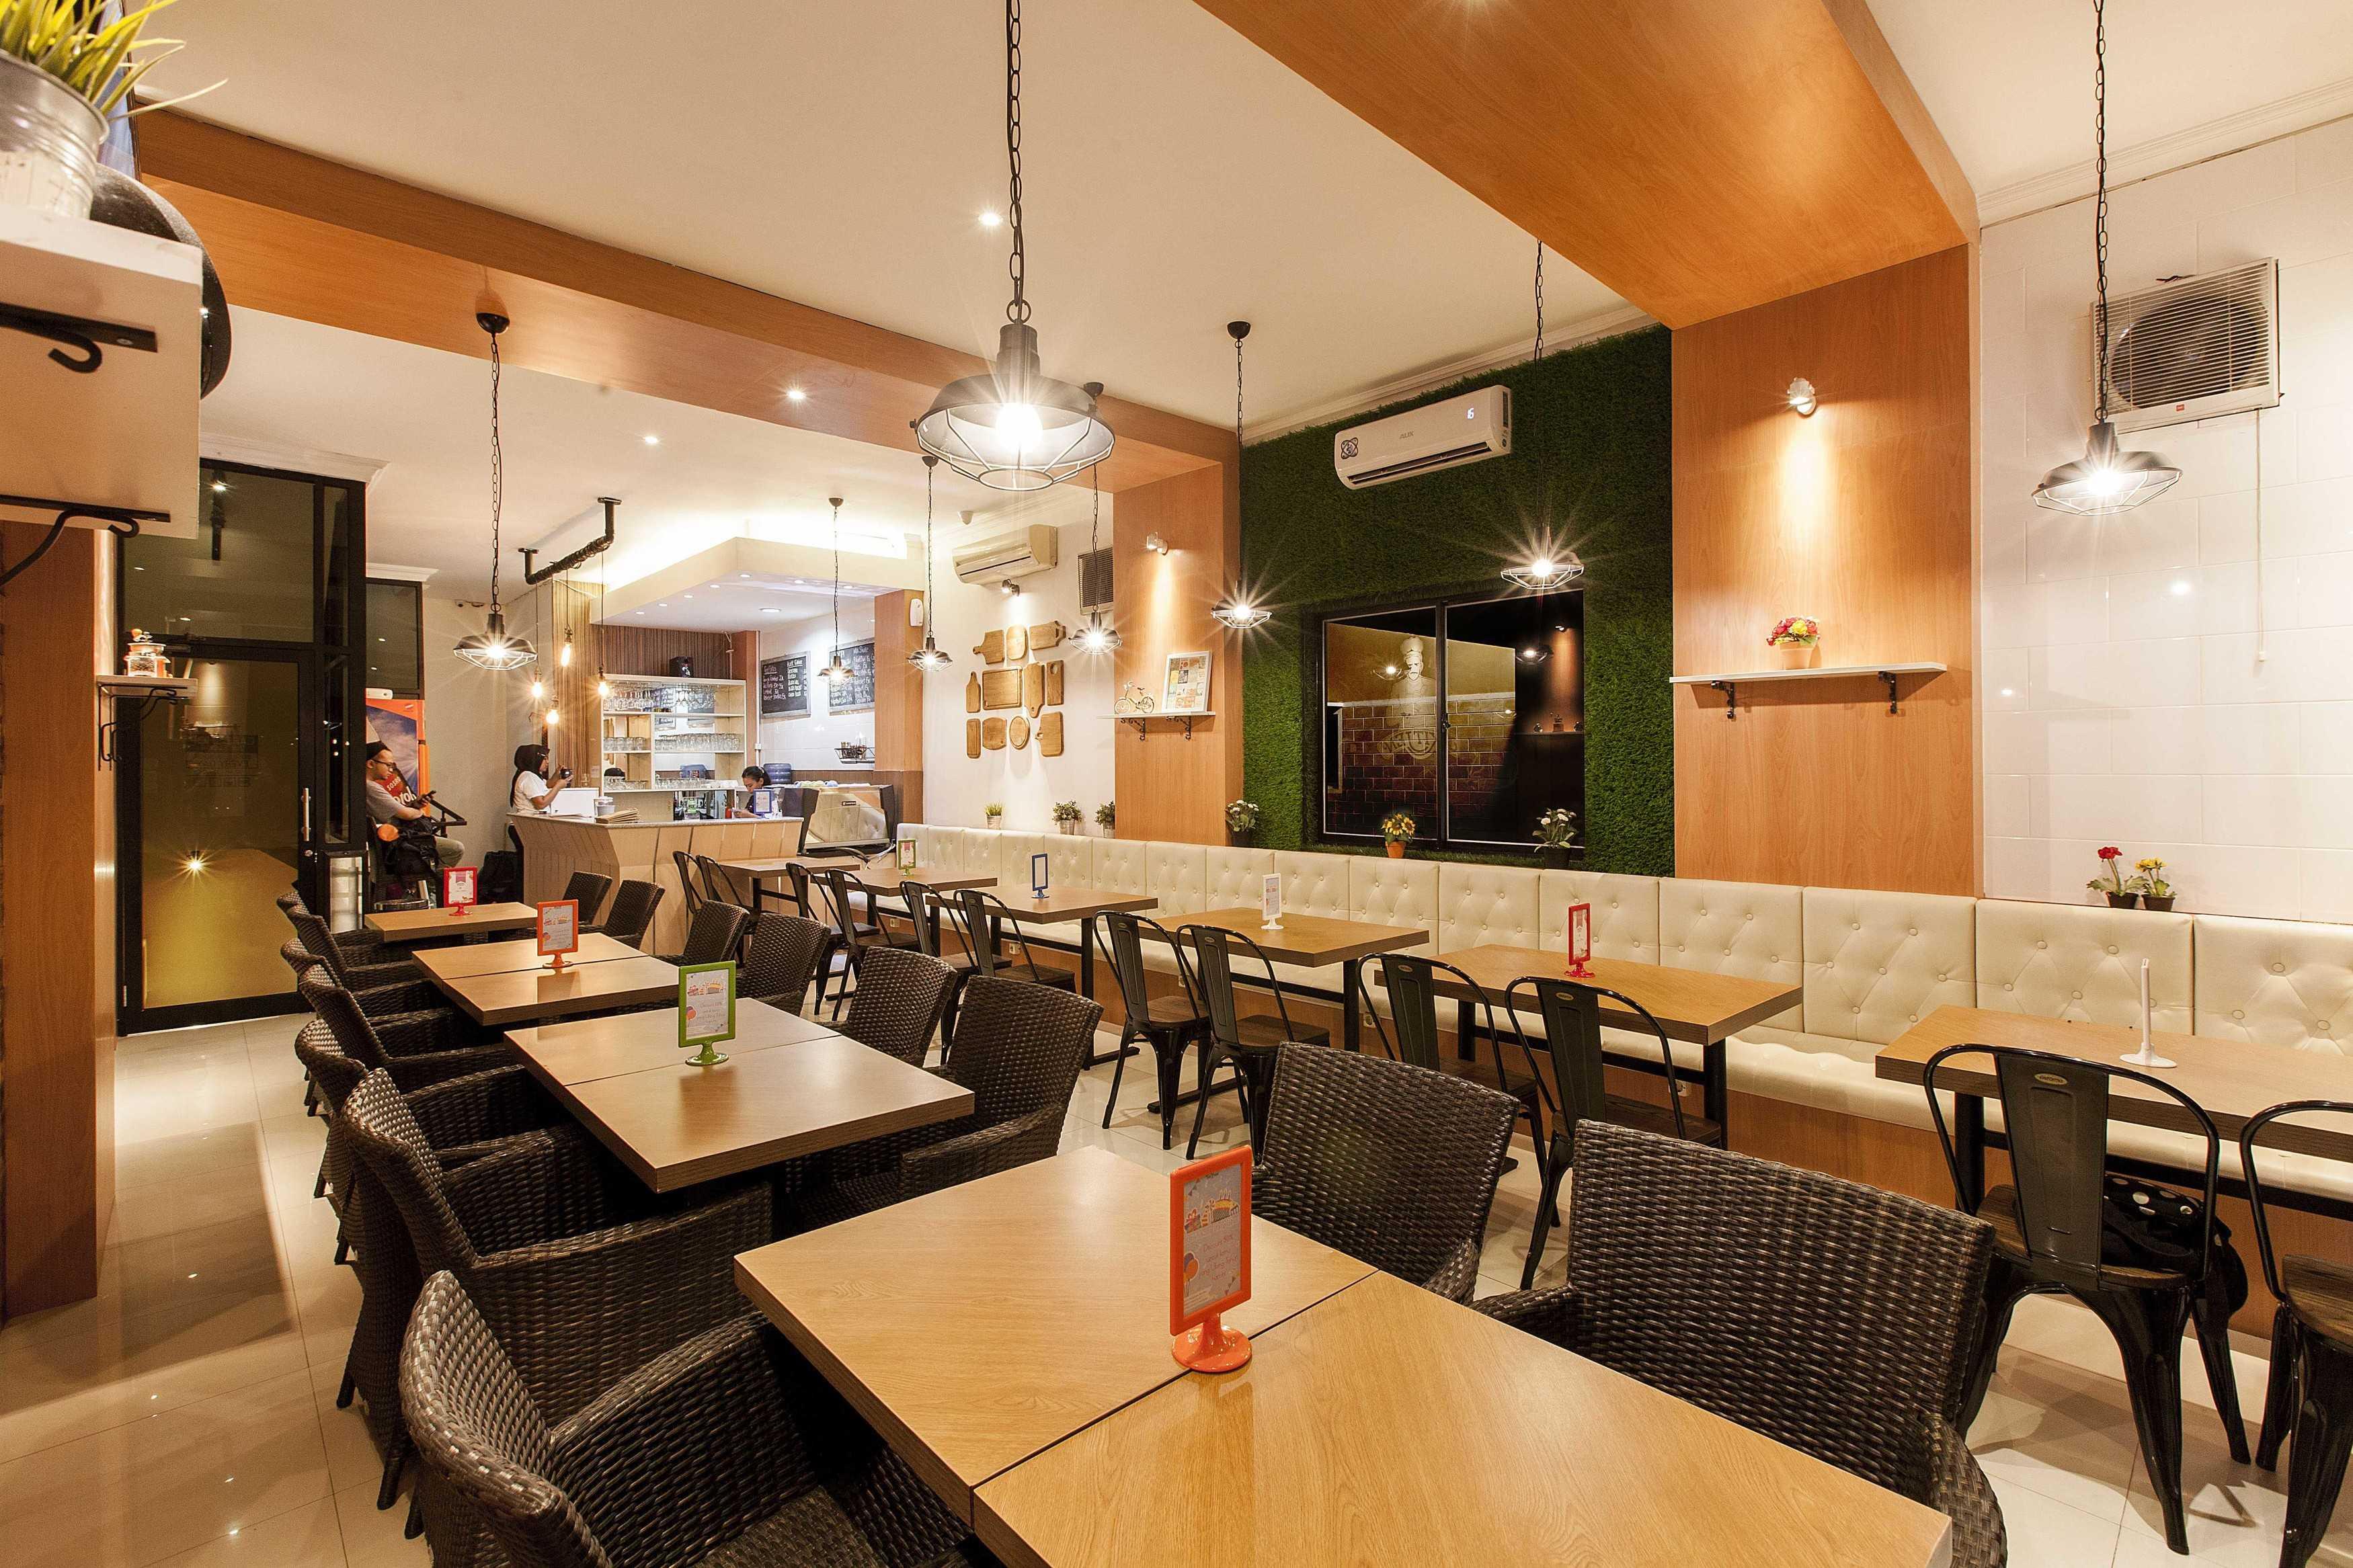 Yardd D'kitjen Cafe Tangerang, Indonesia Tangerang, Indonesia Dining Area Modern  9725